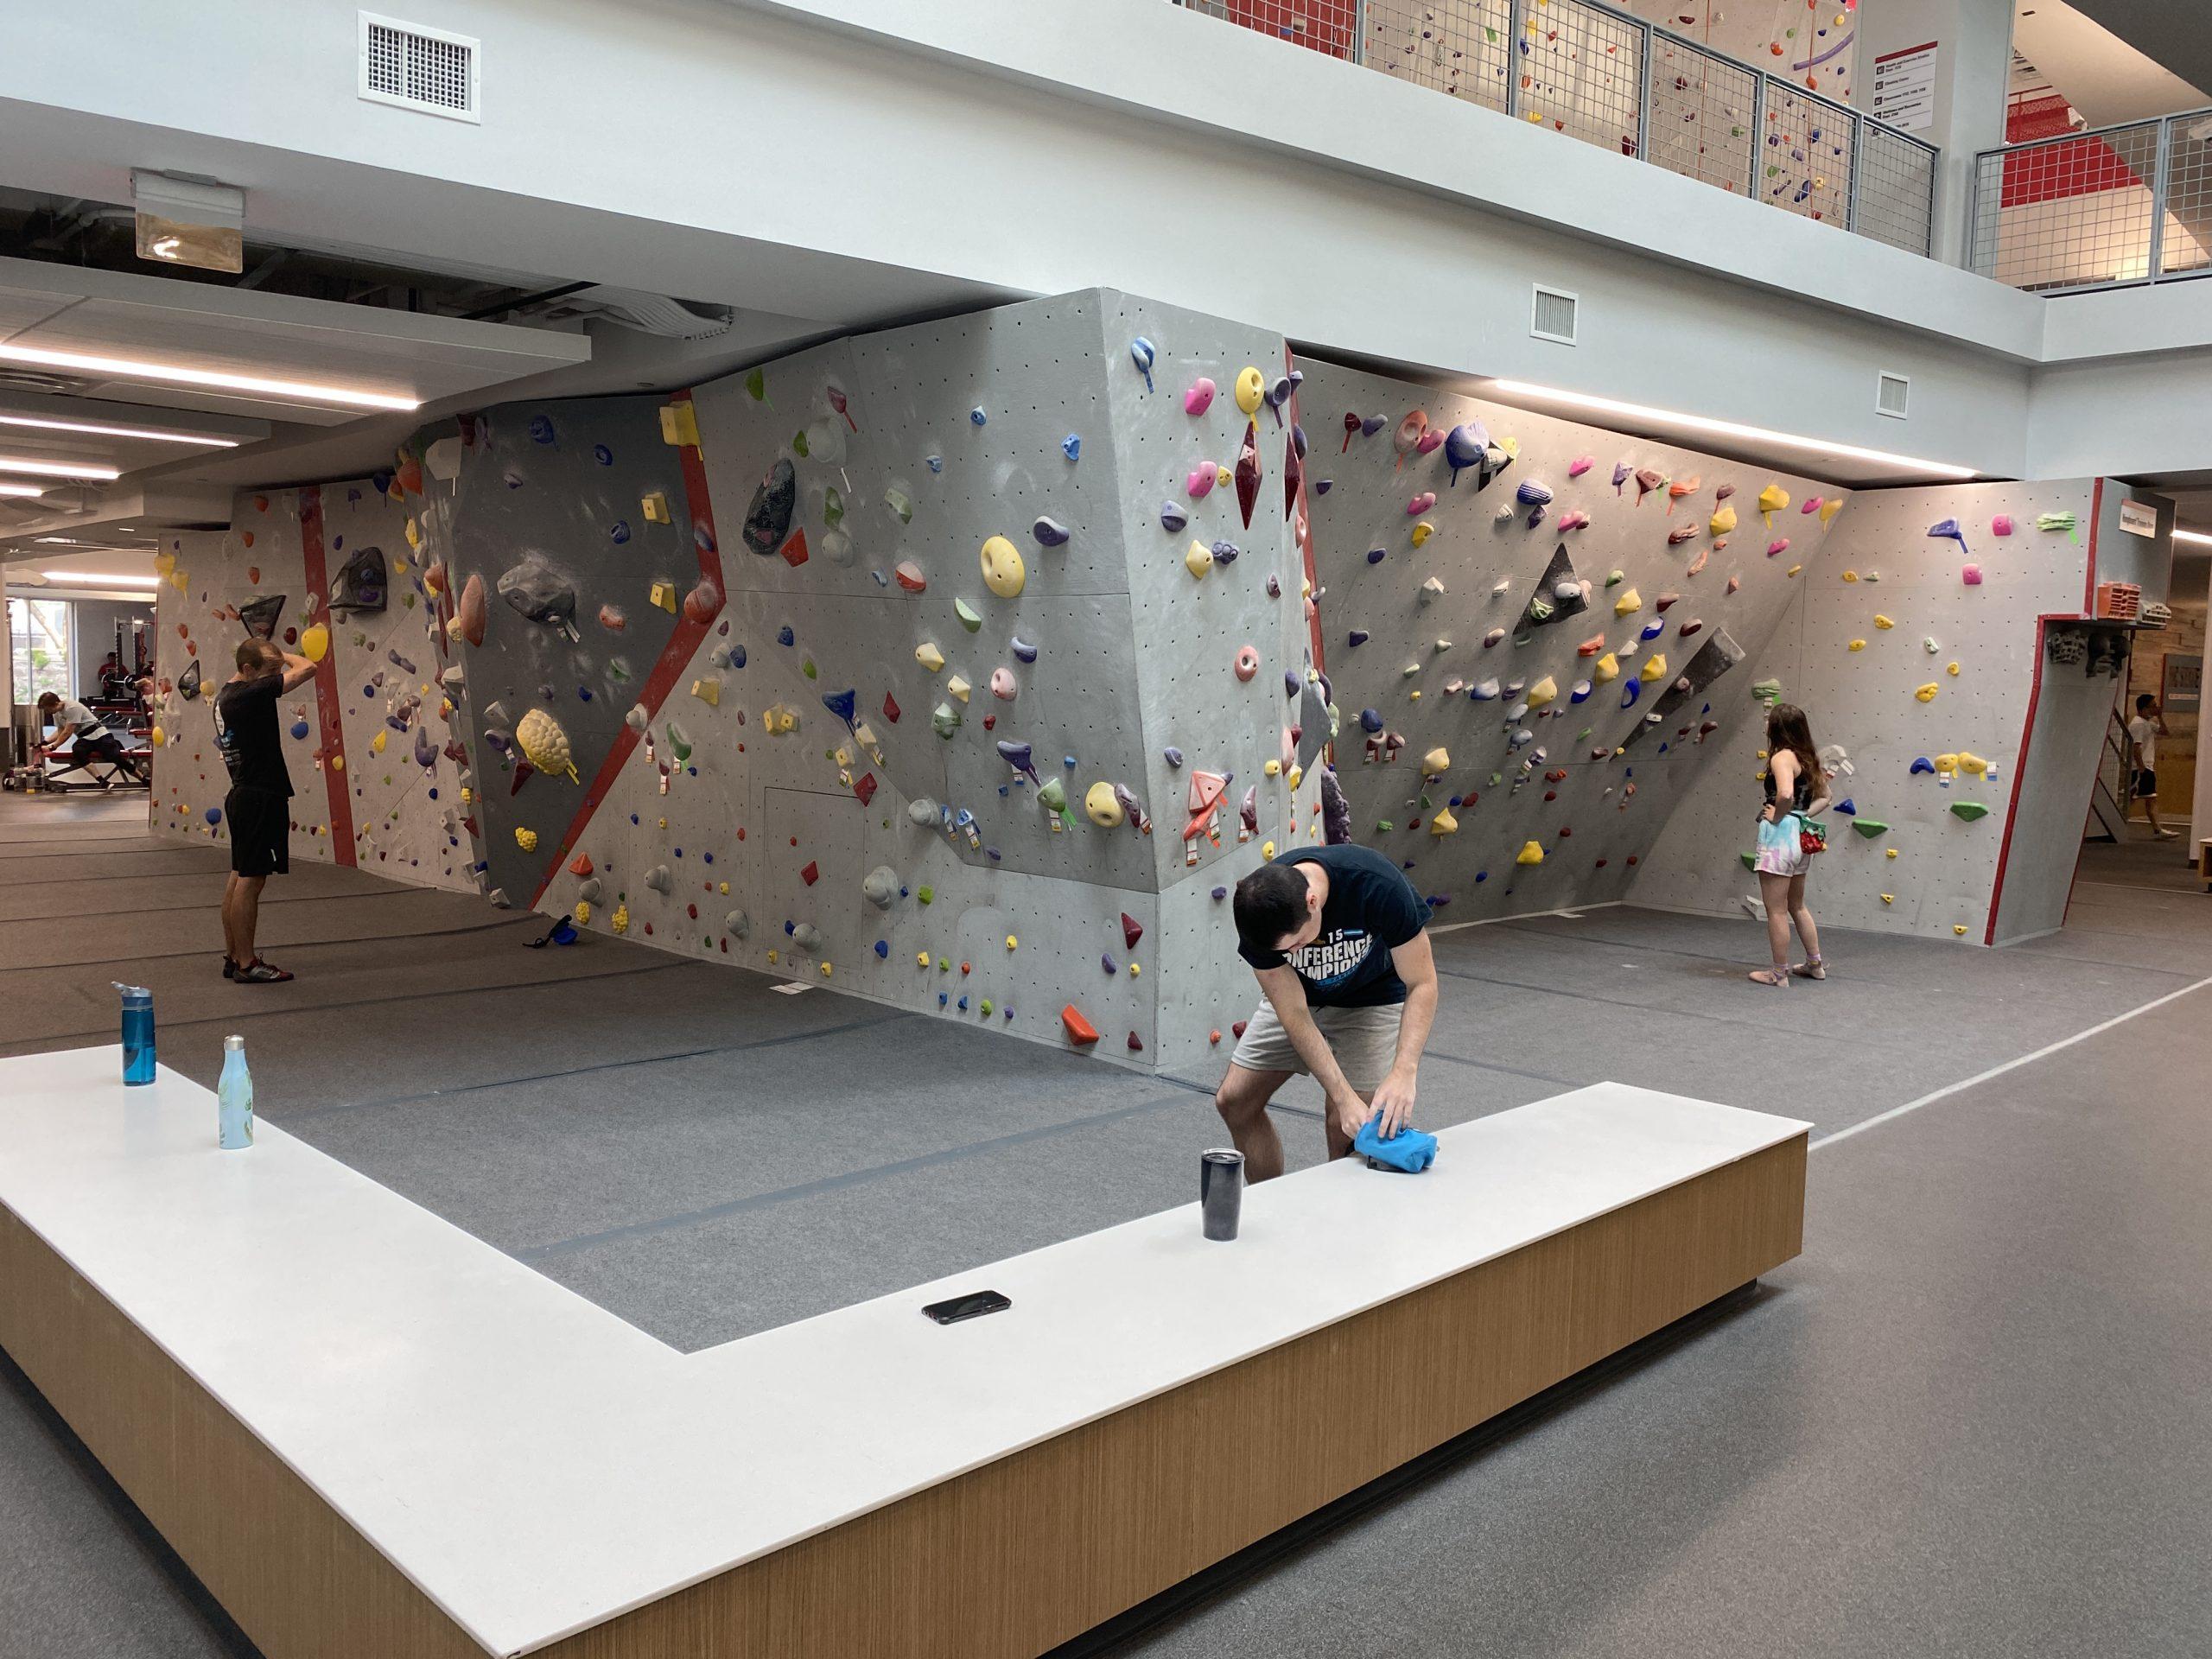 Nicrolite Panel build a bouldering Gym at NCSU